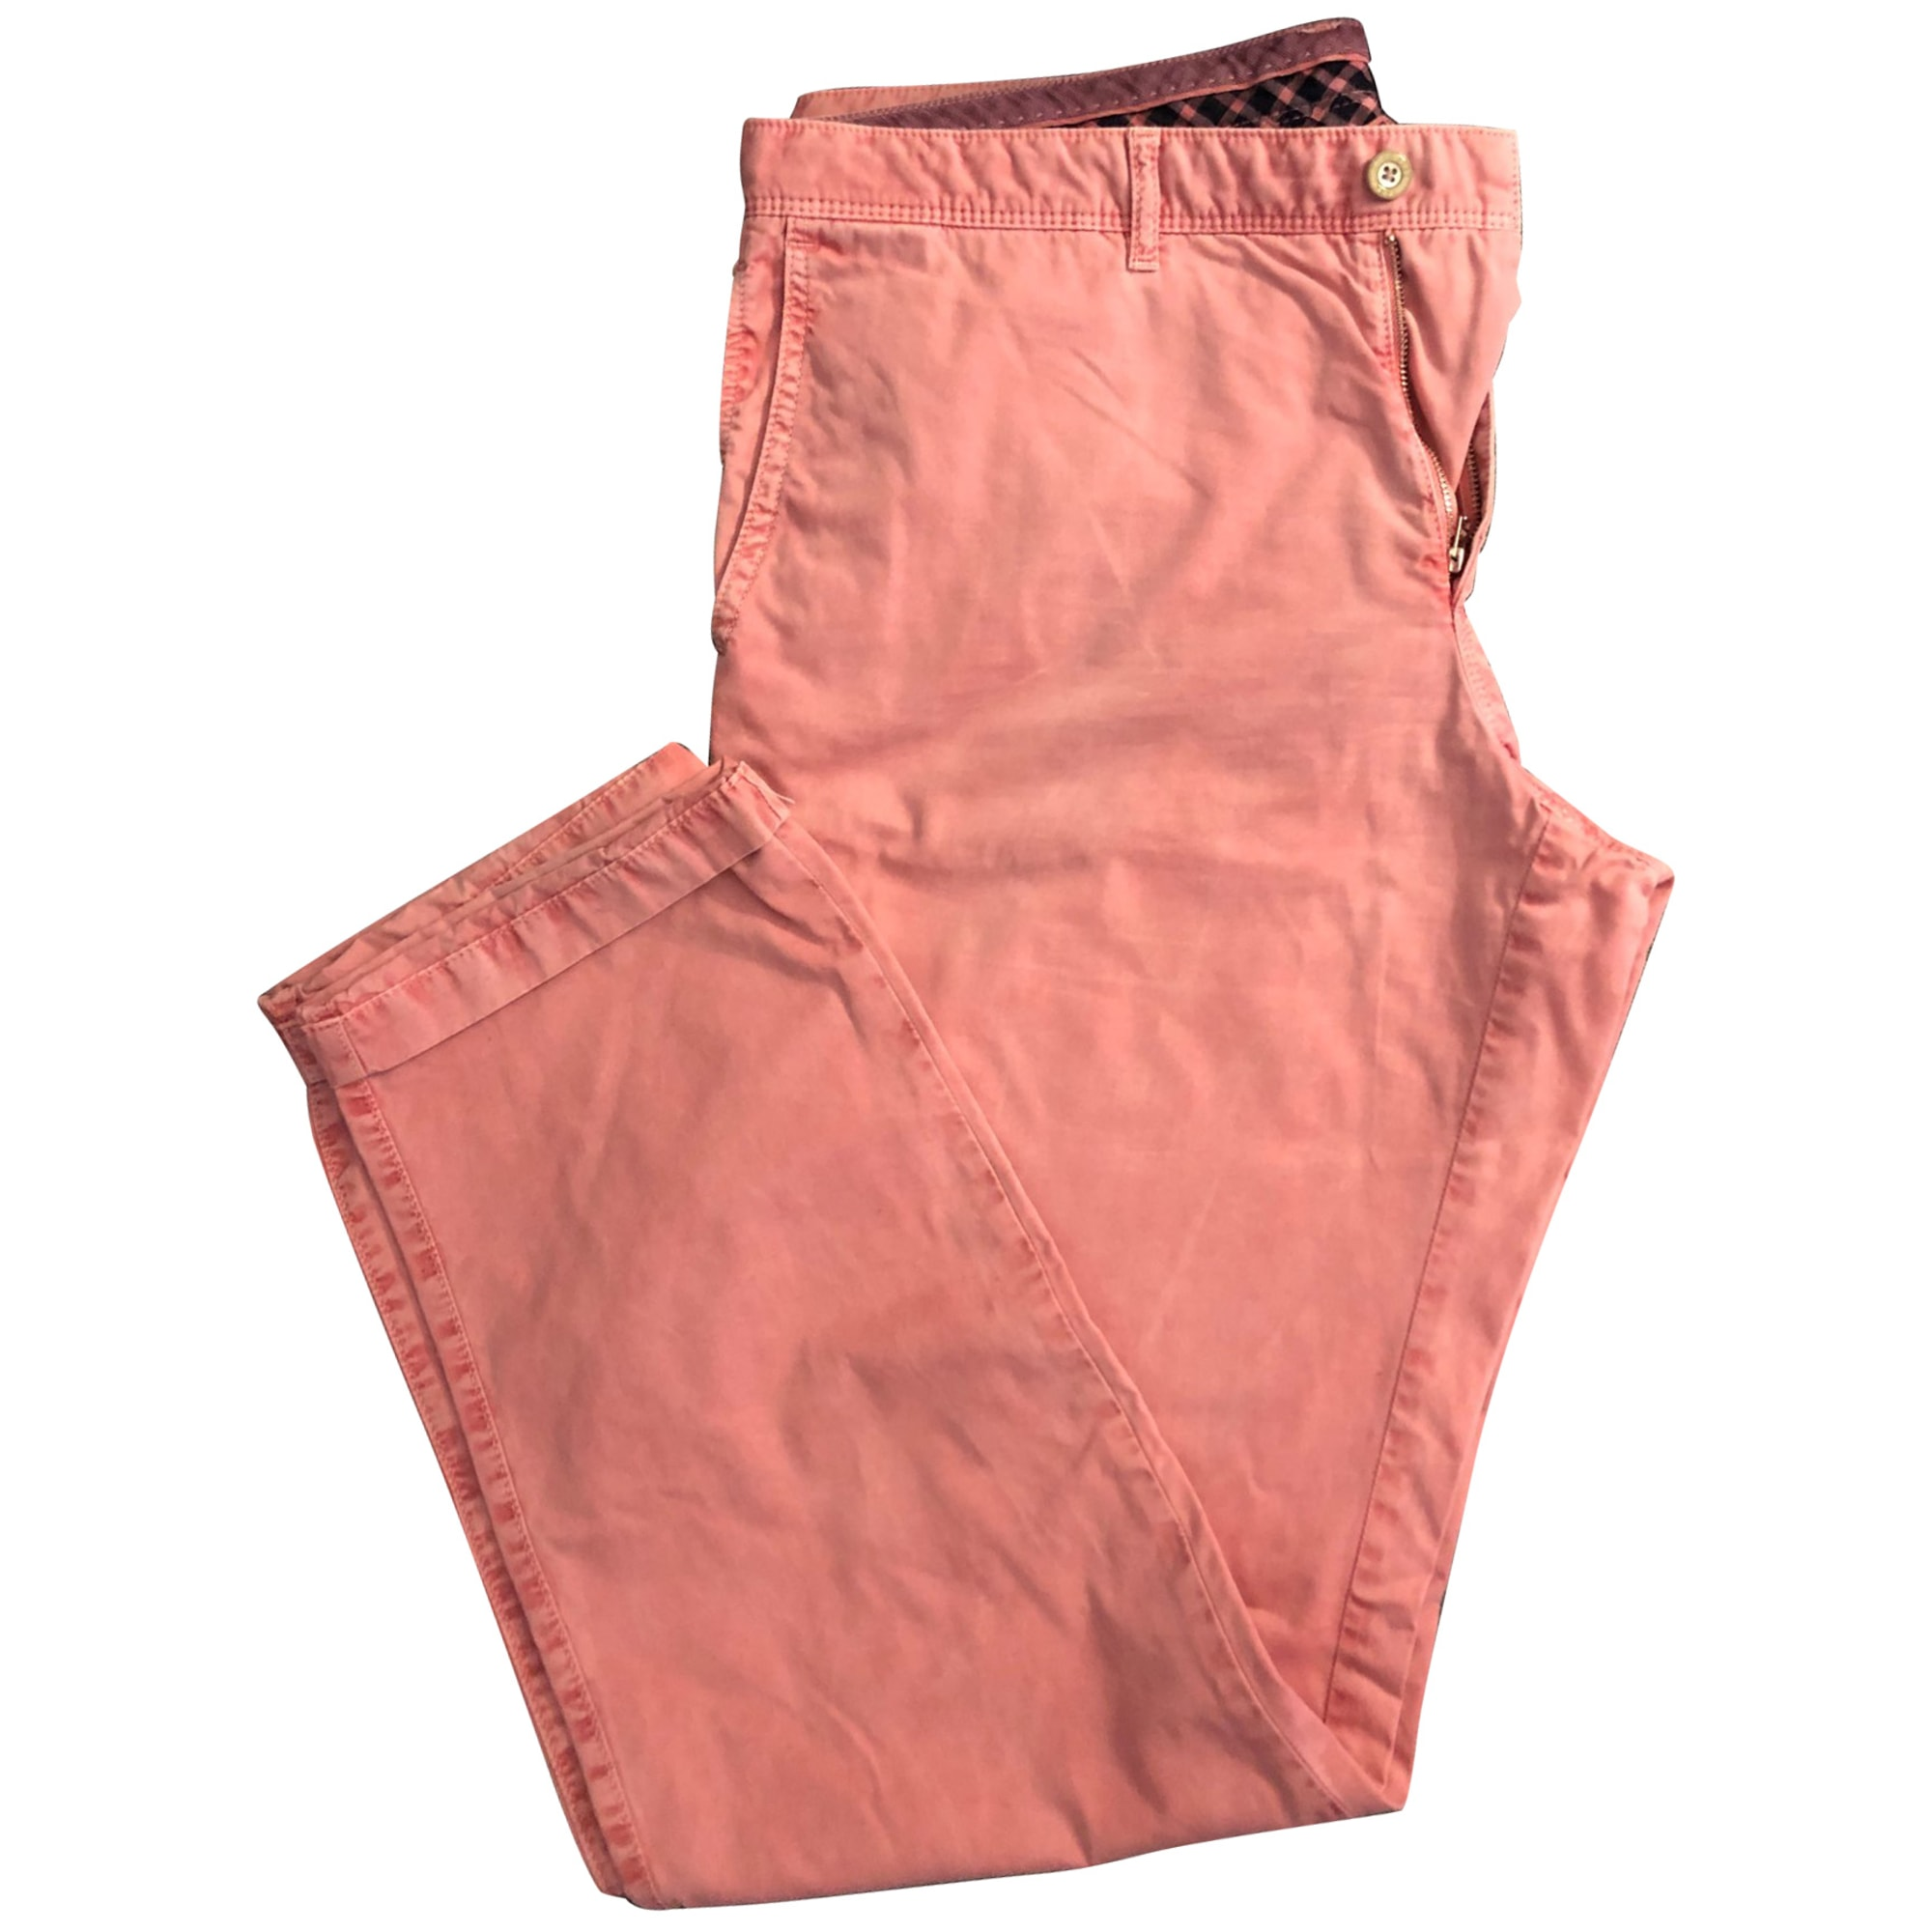 Pantalon droit HUGO BOSS Rose, fuschia, vieux rose